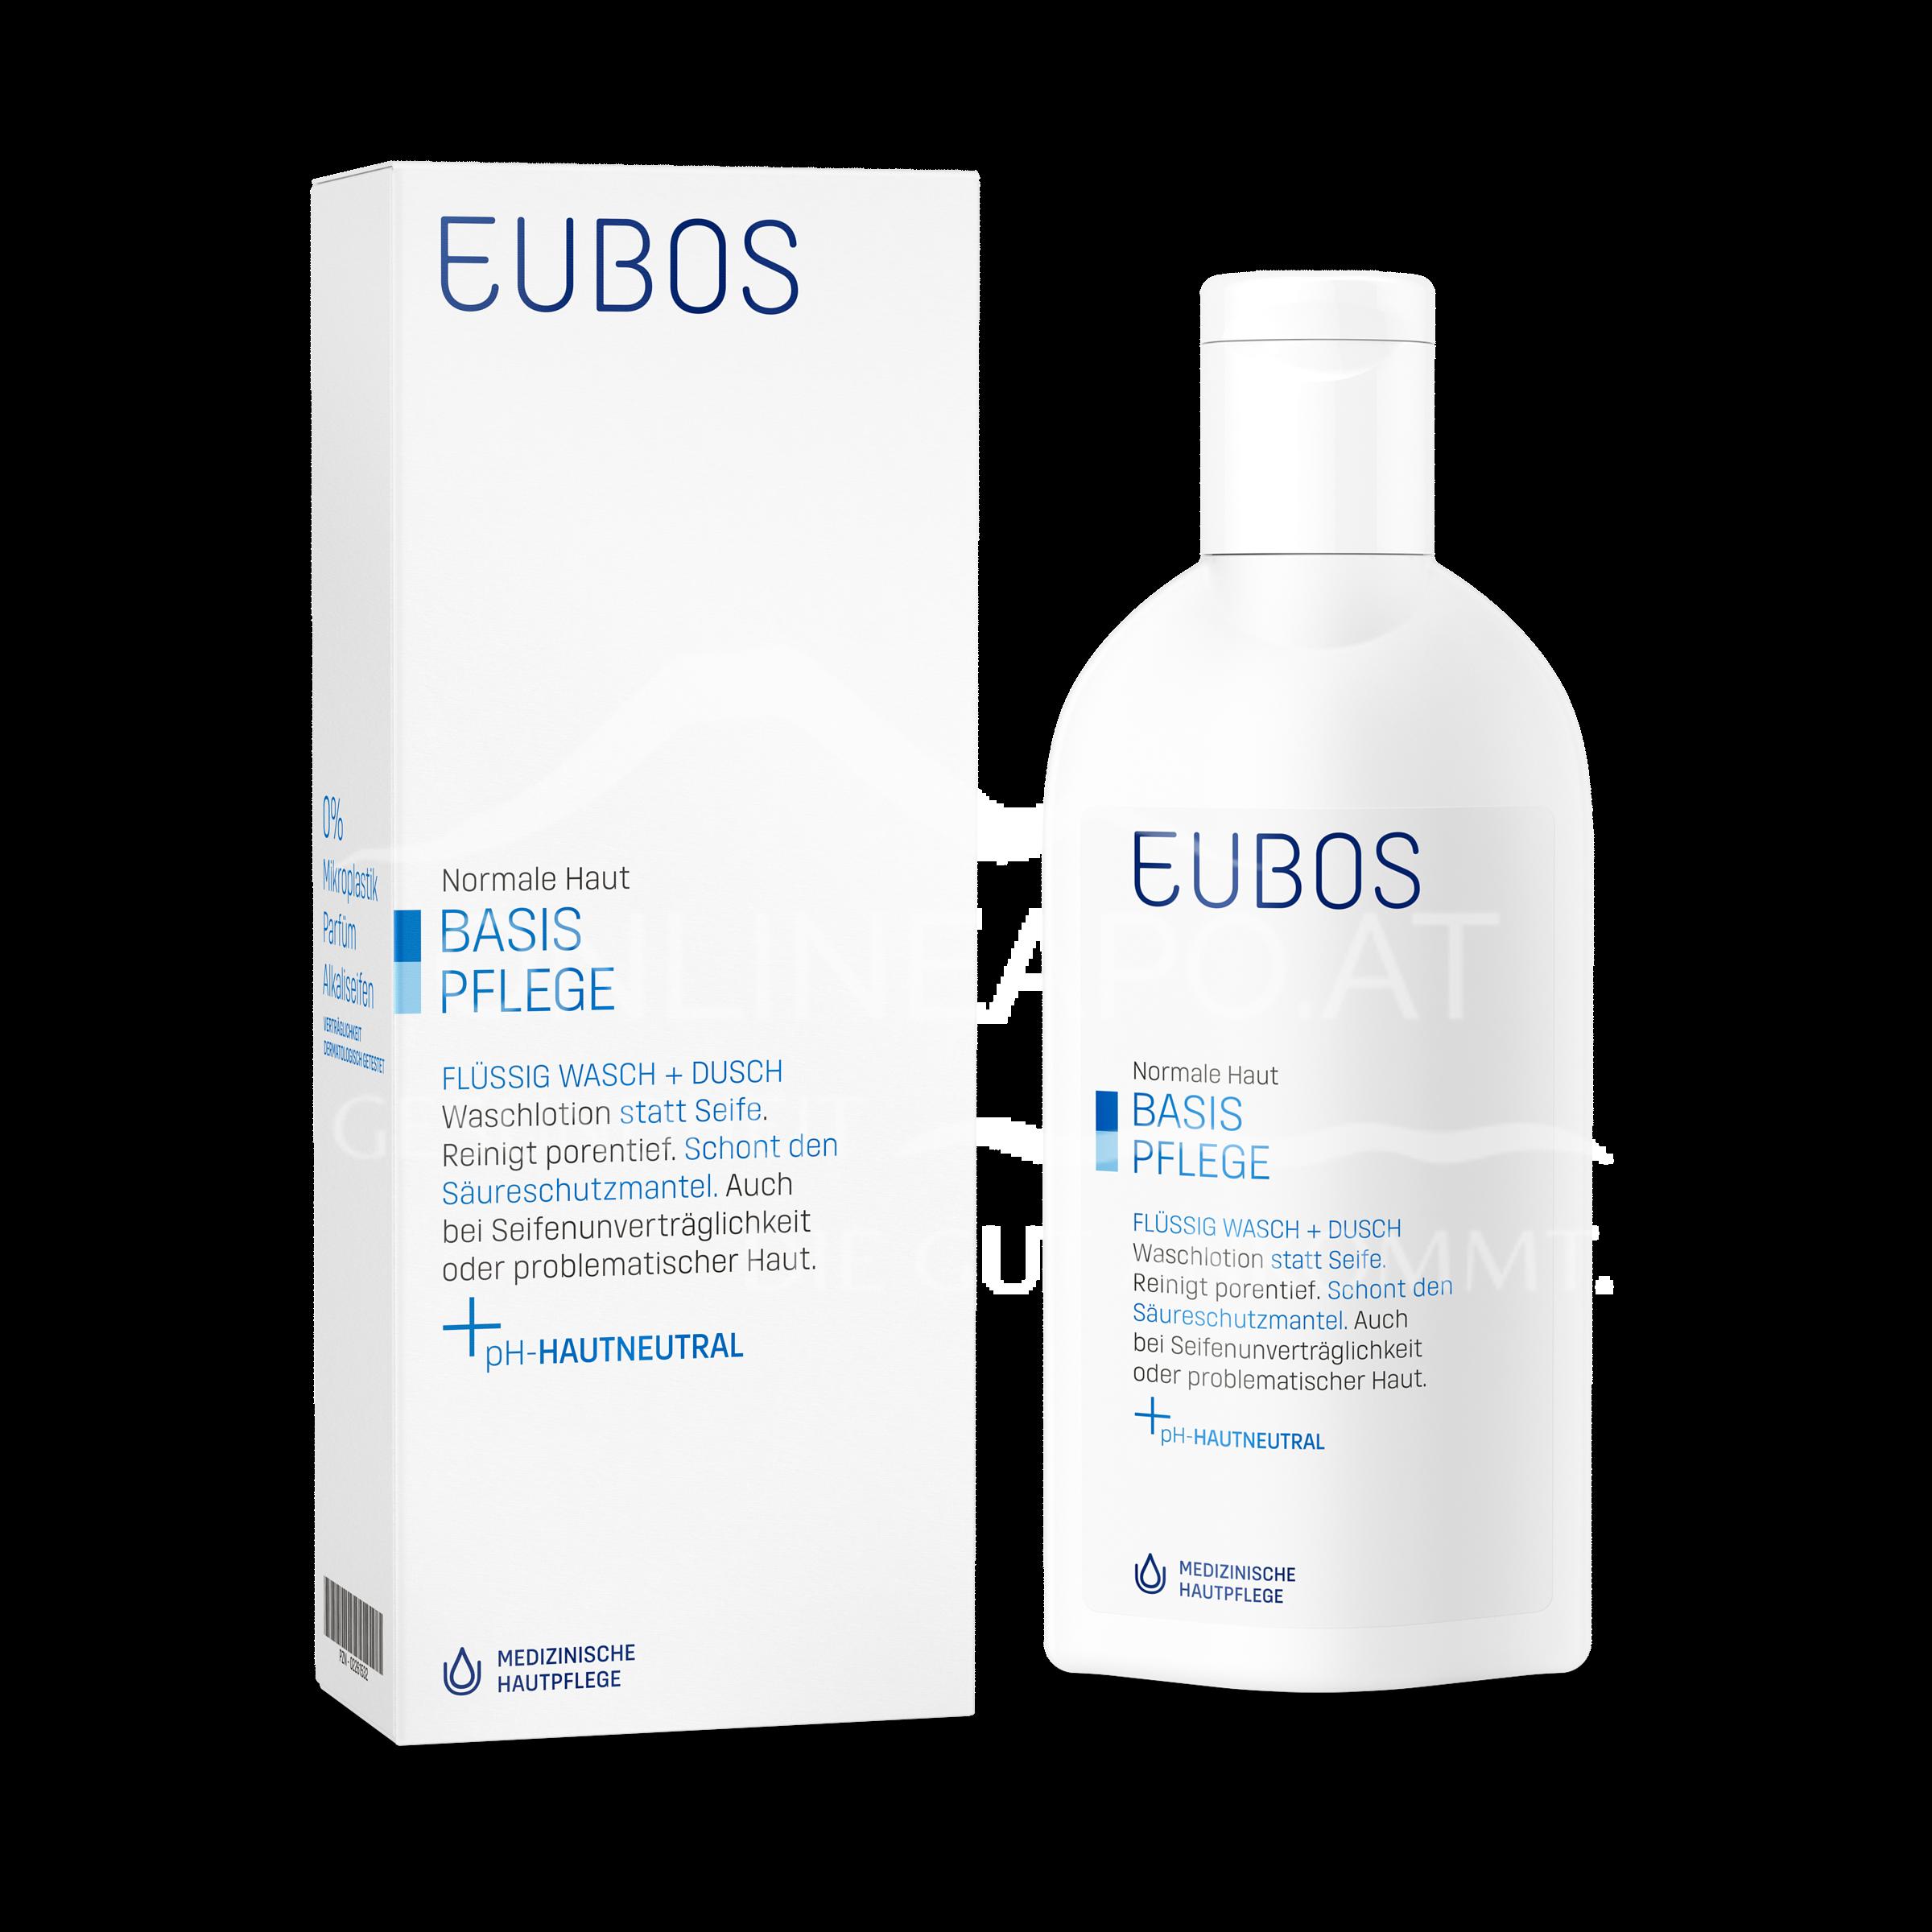 Eubos FLÜSSIG WASCH+DUSCH BLAU Parfümfrei